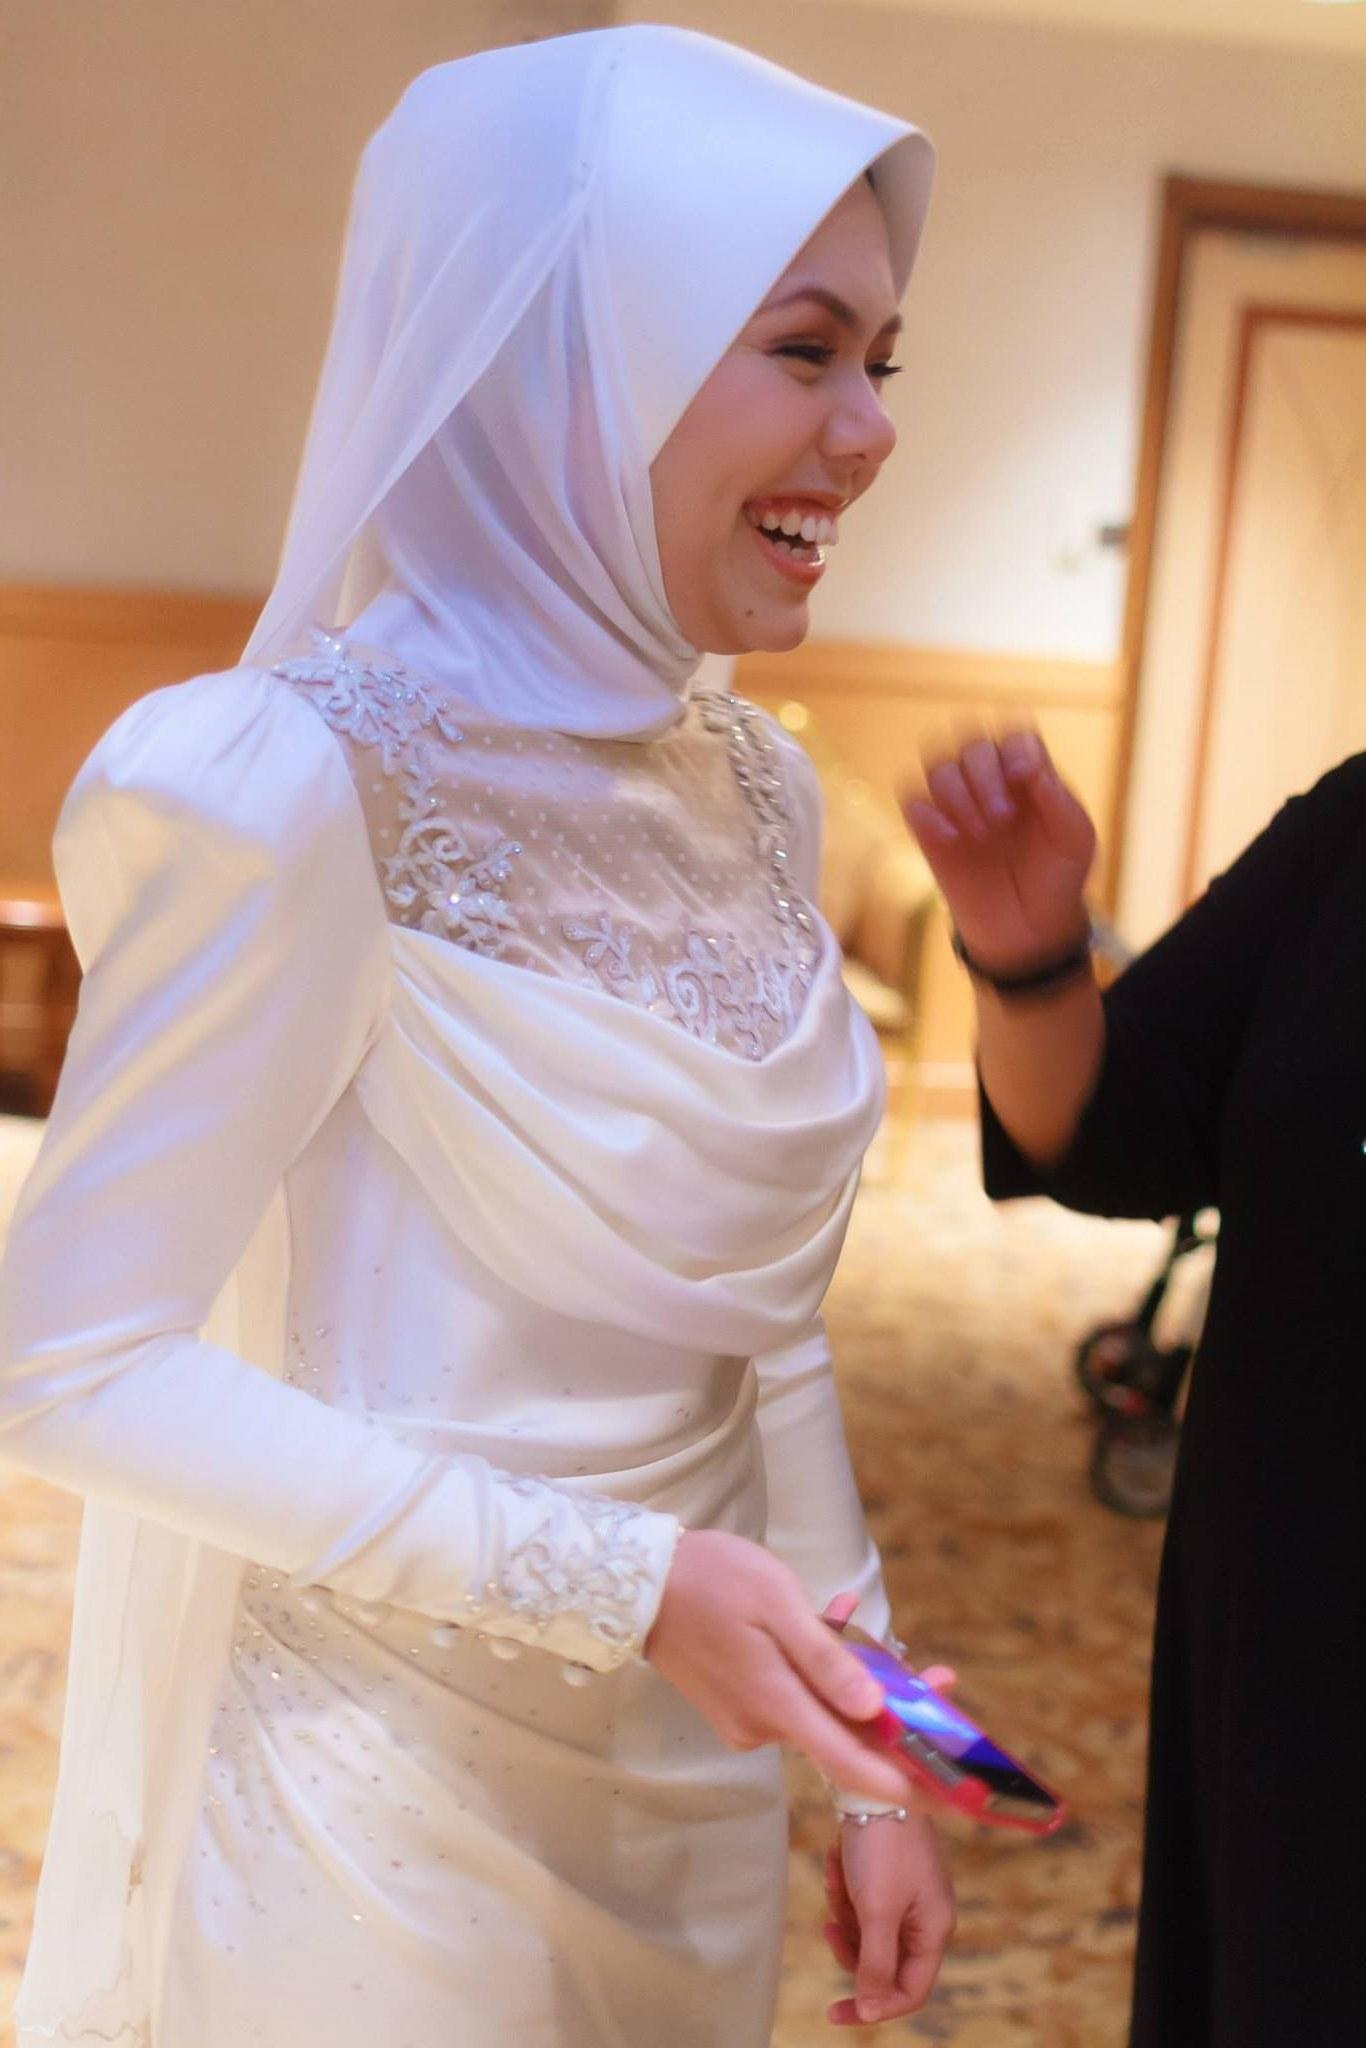 Design Baju Muslim Pengantin Ffdn Baju Pengantin Moden Baju Pengantin songket by Melinda